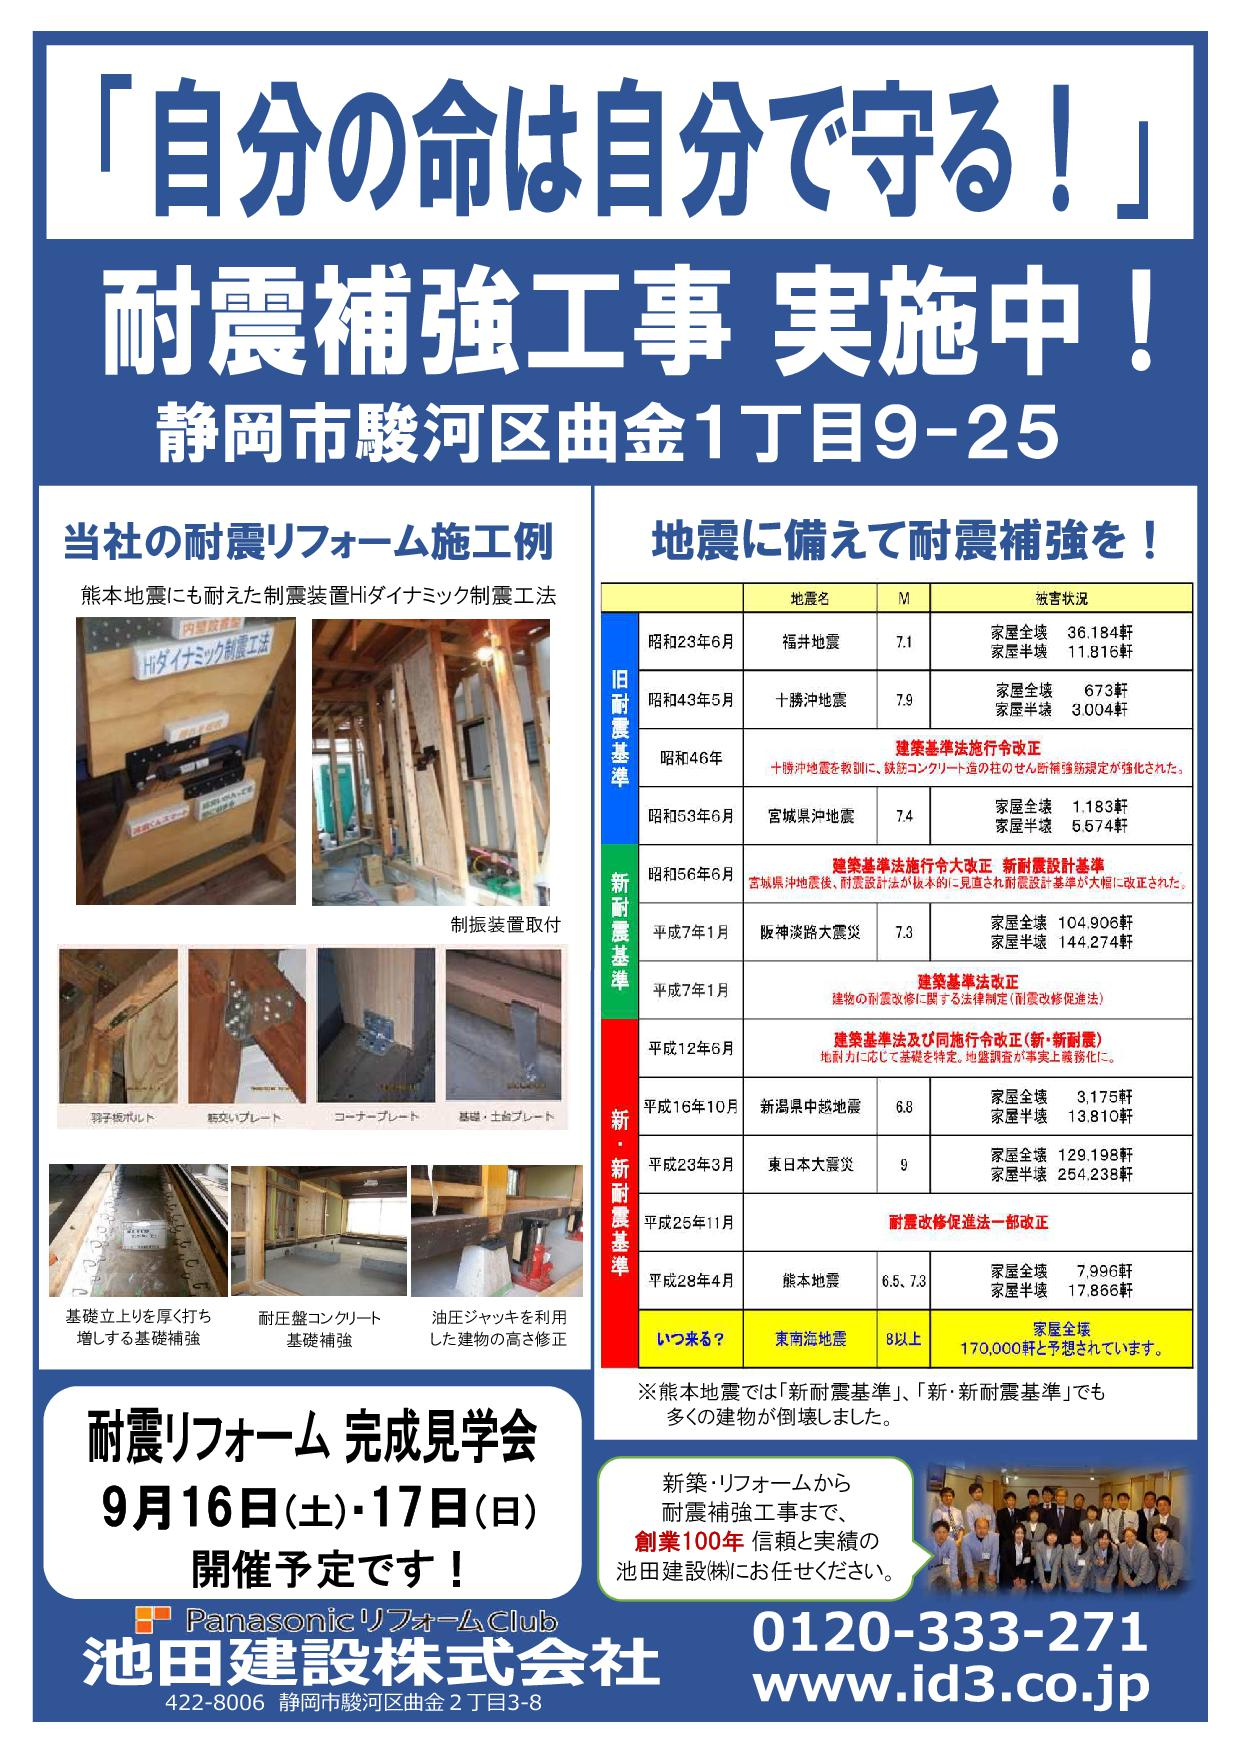 H29082627櫻井様邸耐震リフォーム見学2会